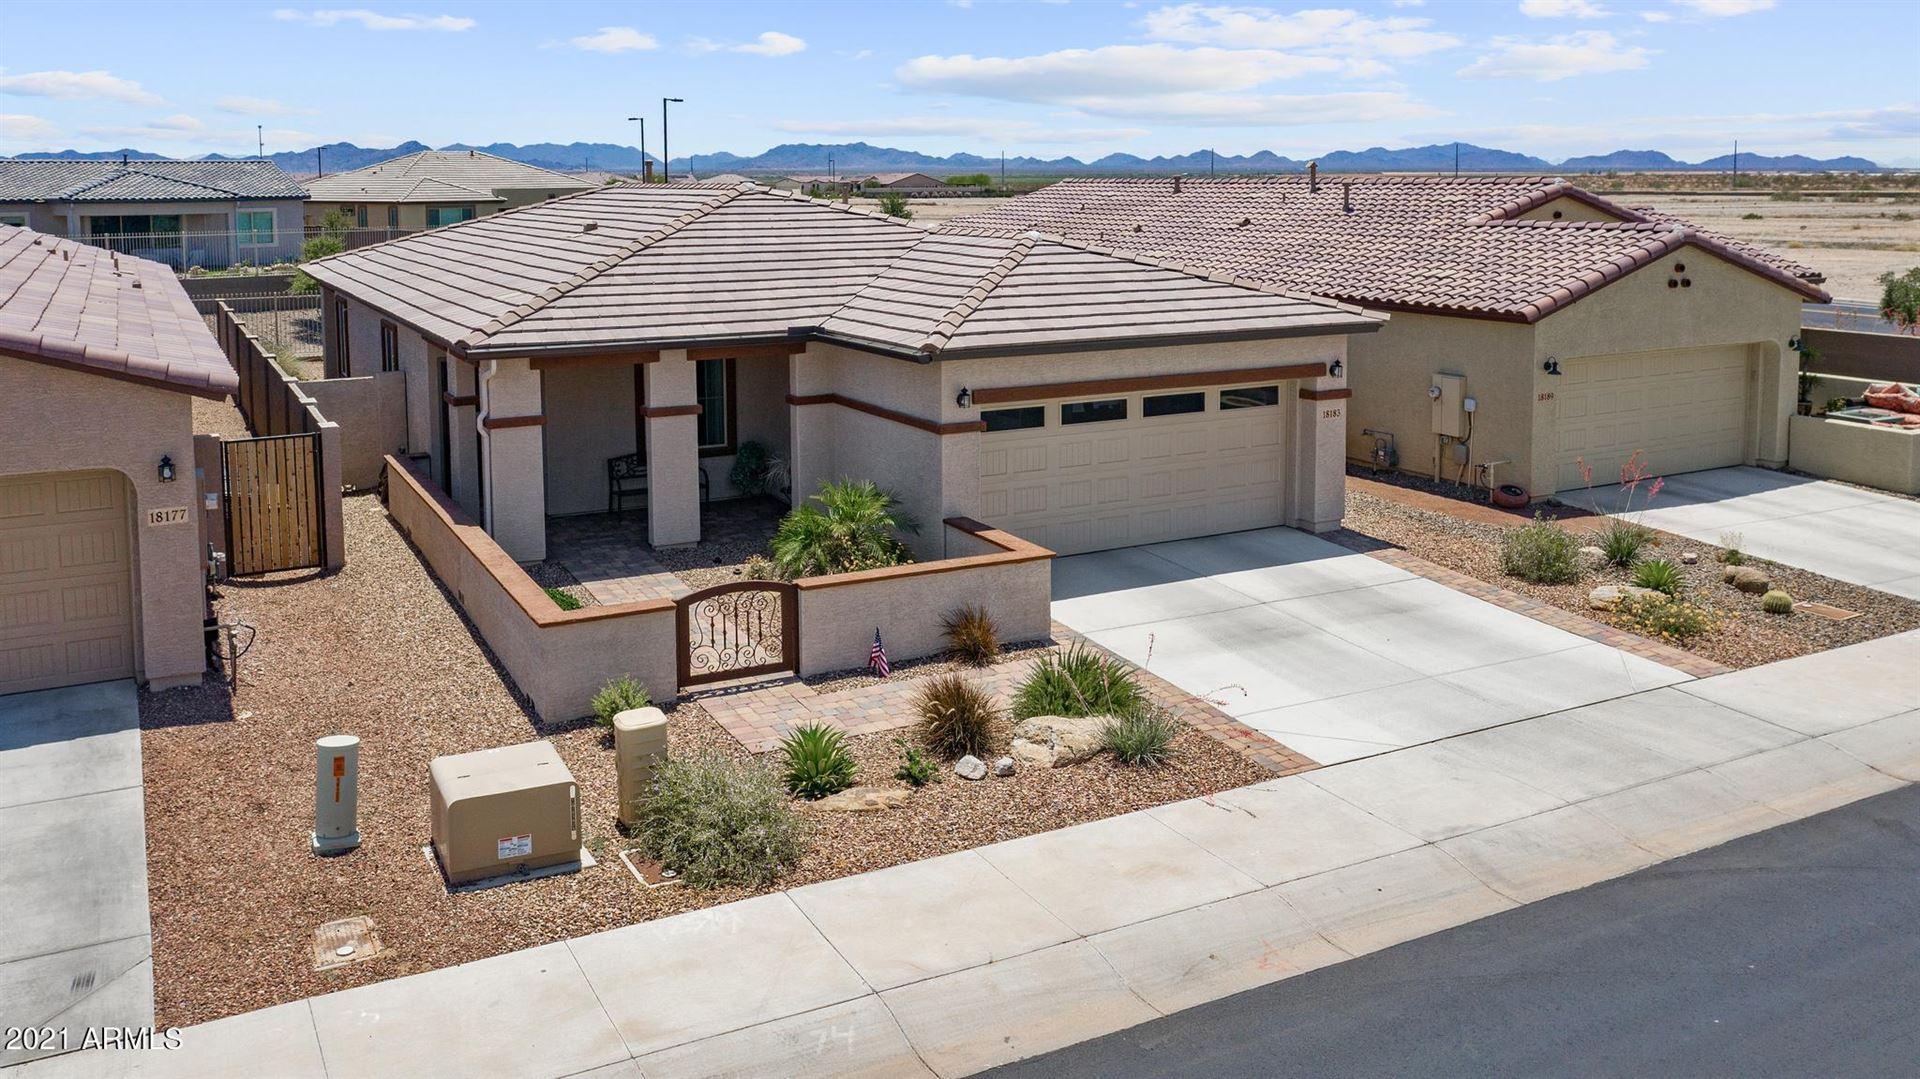 Photo of 18183 W GLENHAVEN Drive, Goodyear, AZ 85338 (MLS # 6248525)